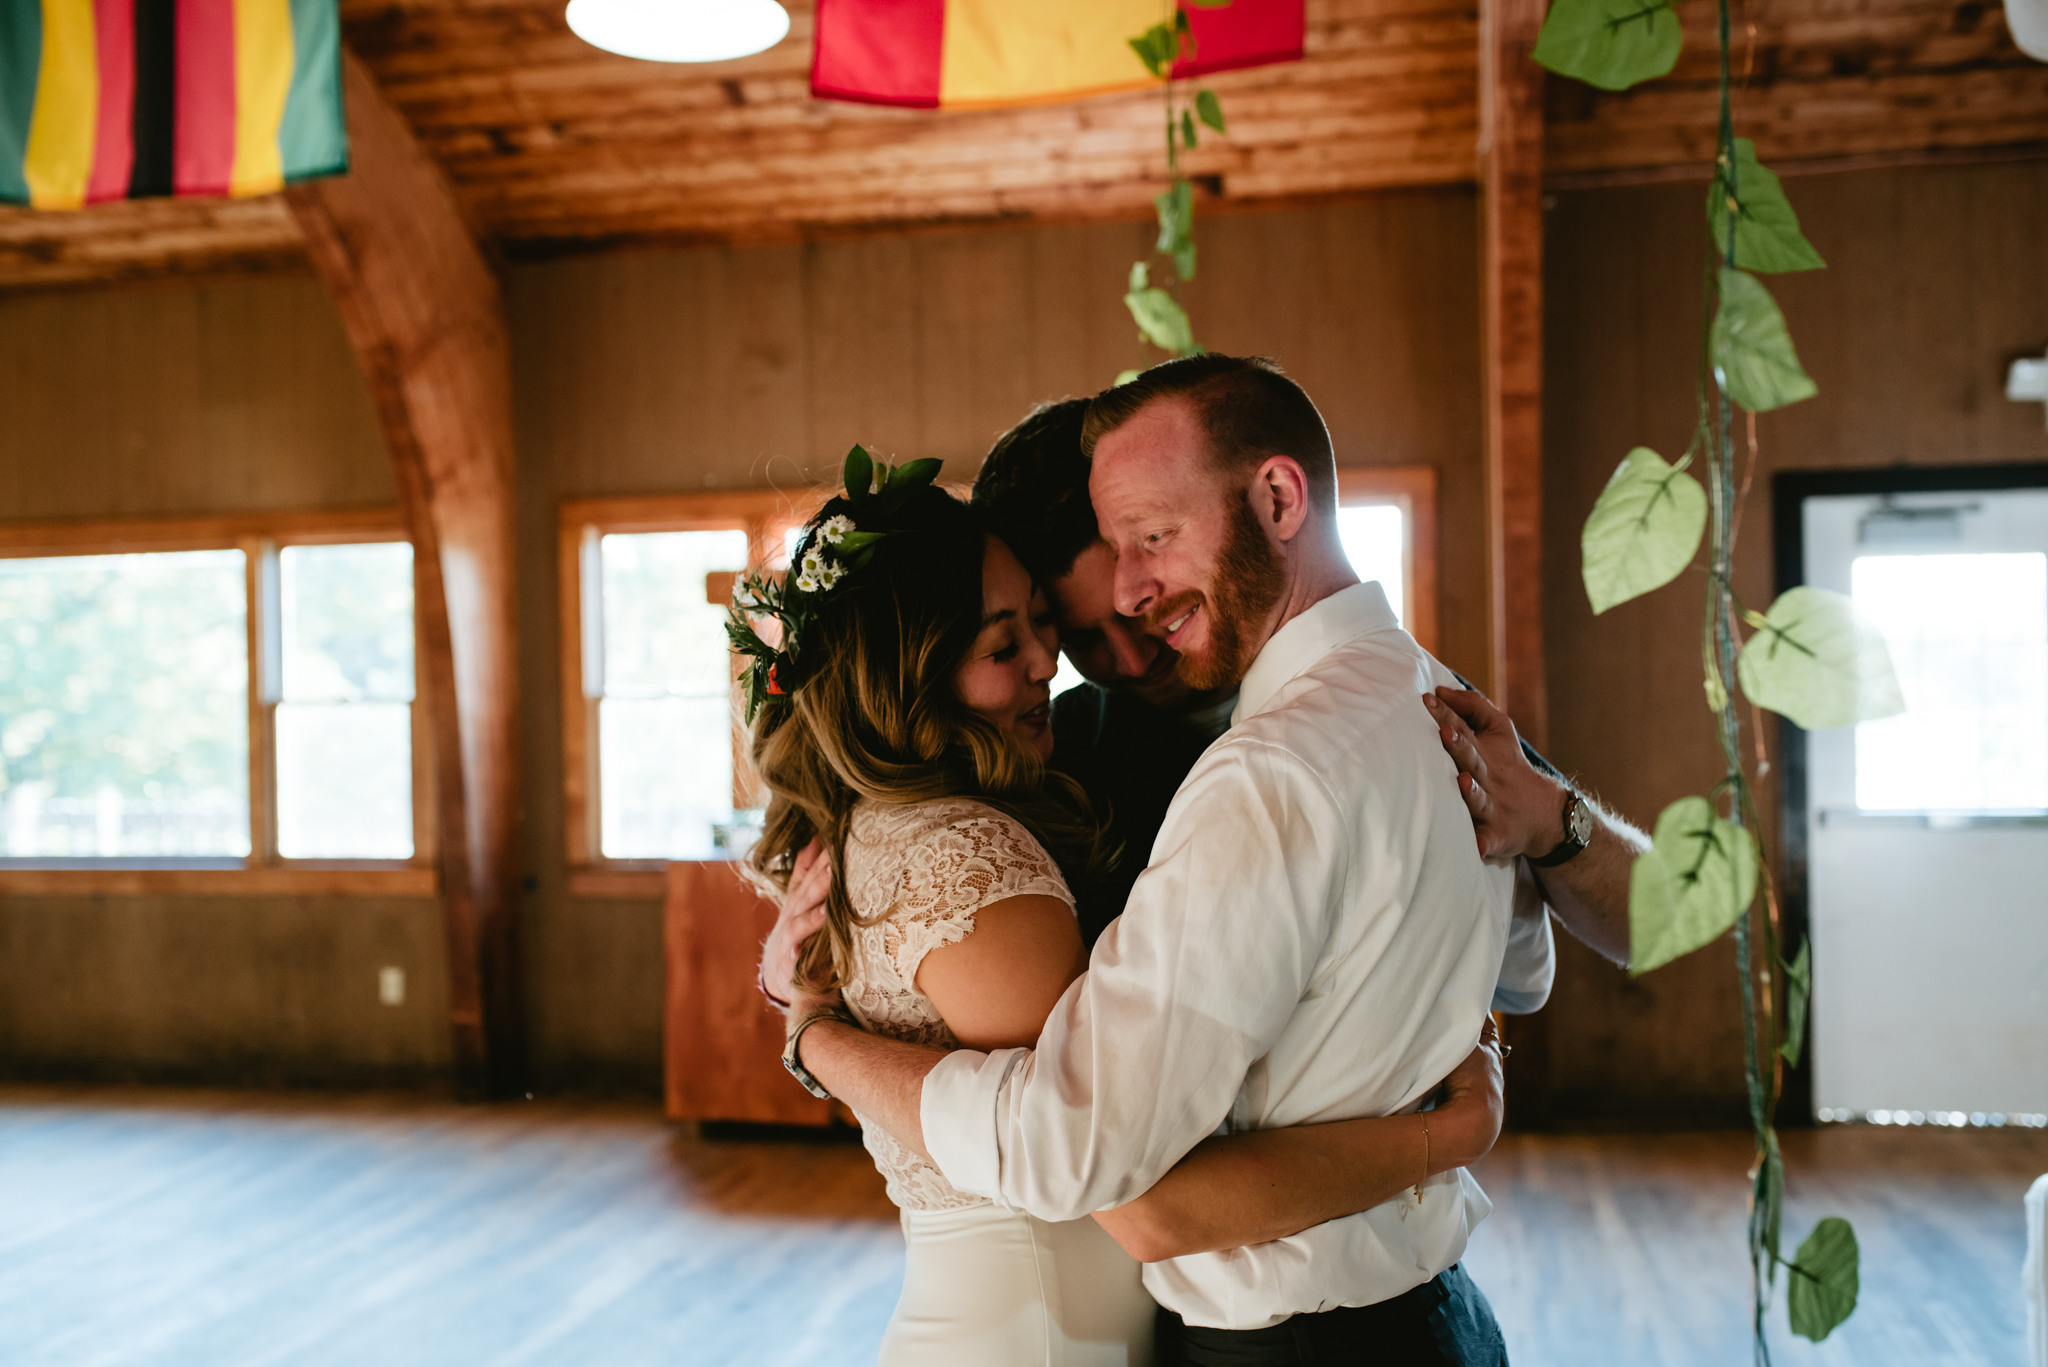 Summer Camp Wedding Photography June 2017 Massachusetts Berkshires Outdoor Wedding Photography Novella Photography Matt and Paulette Griswold (143).jpg